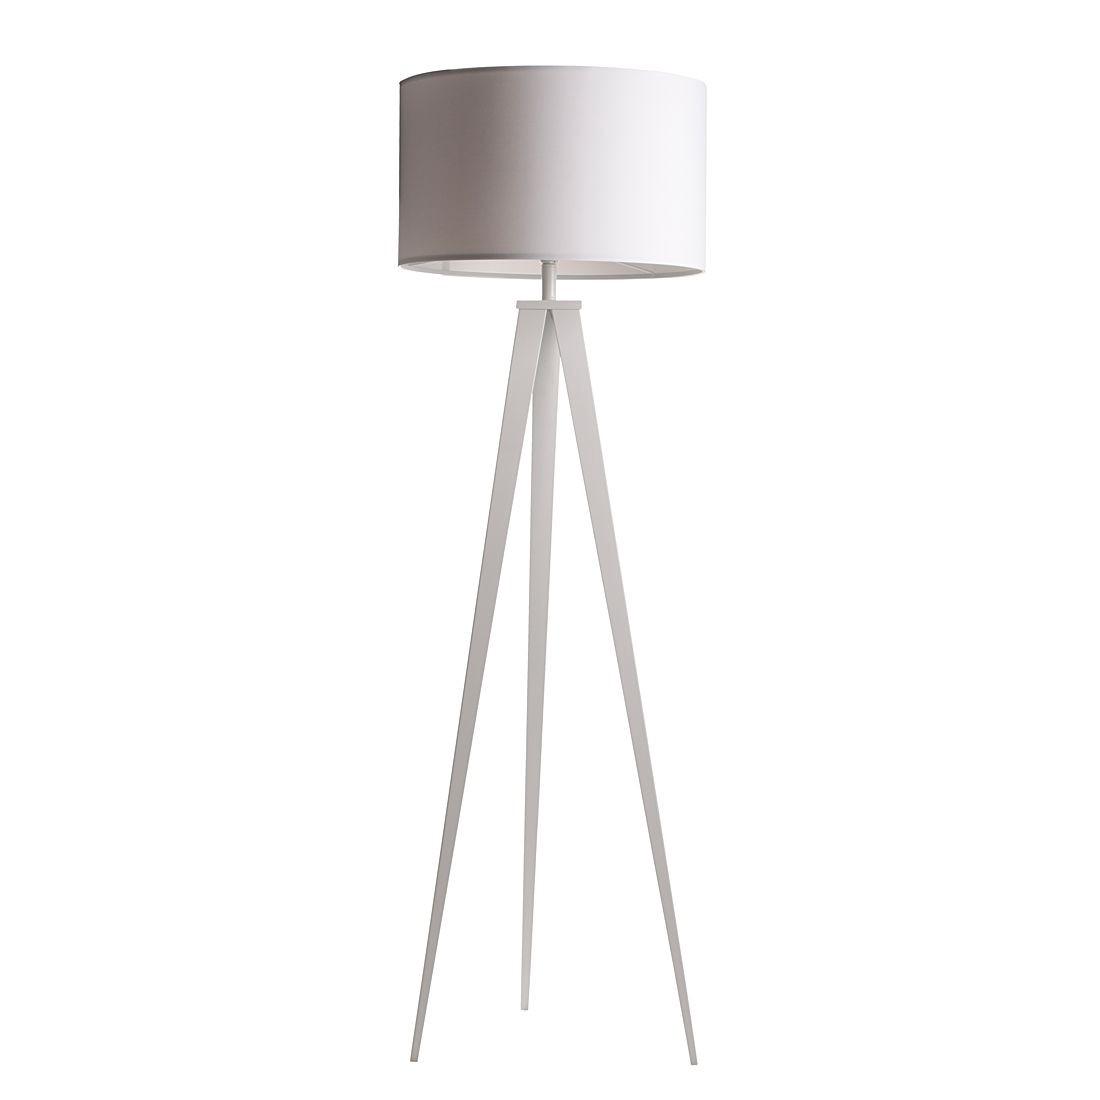 Binnenverlichting  Design meubels  home24be